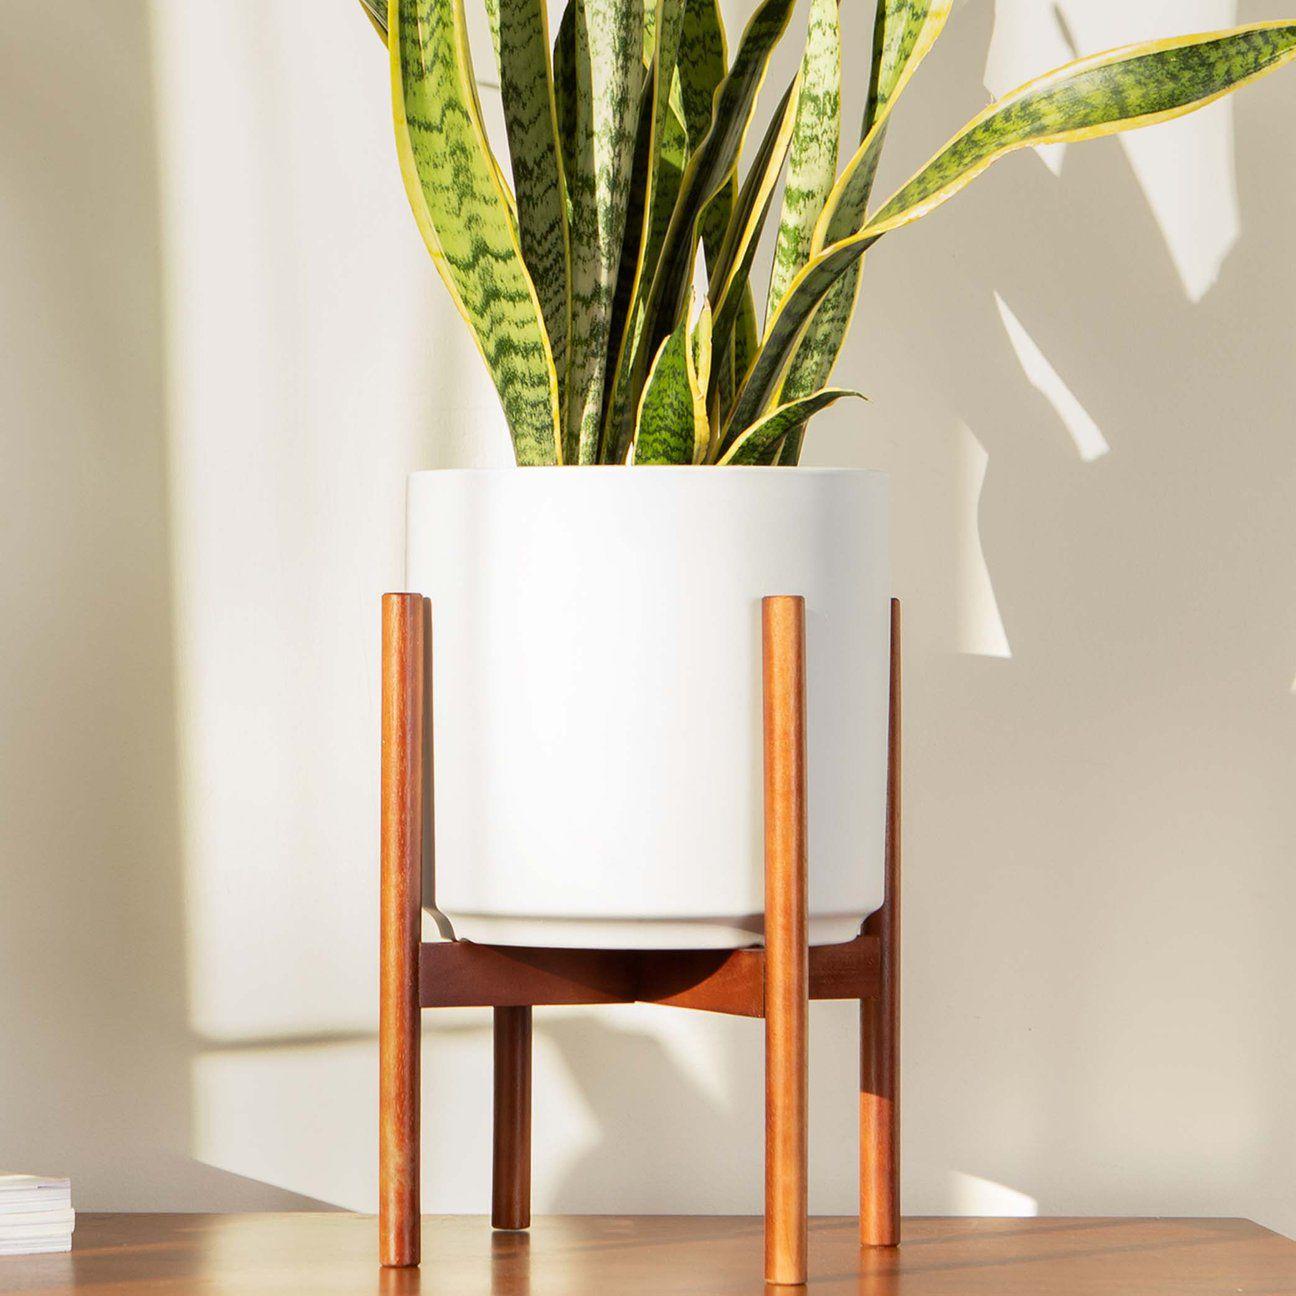 ceramic planter & wood stand set